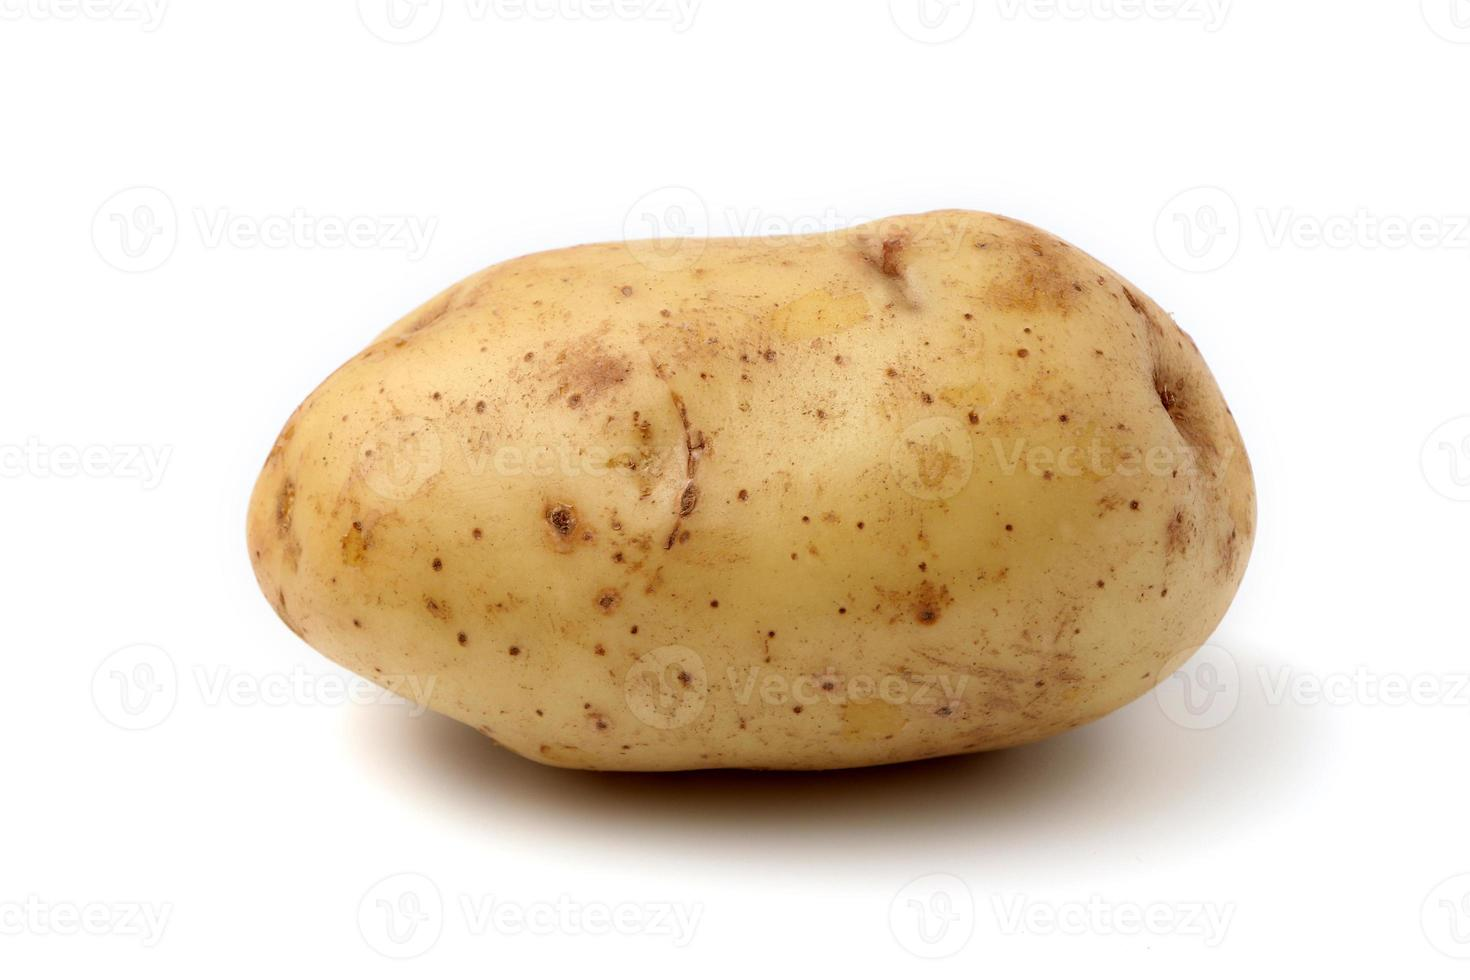 rohe Kartoffeln 9 foto